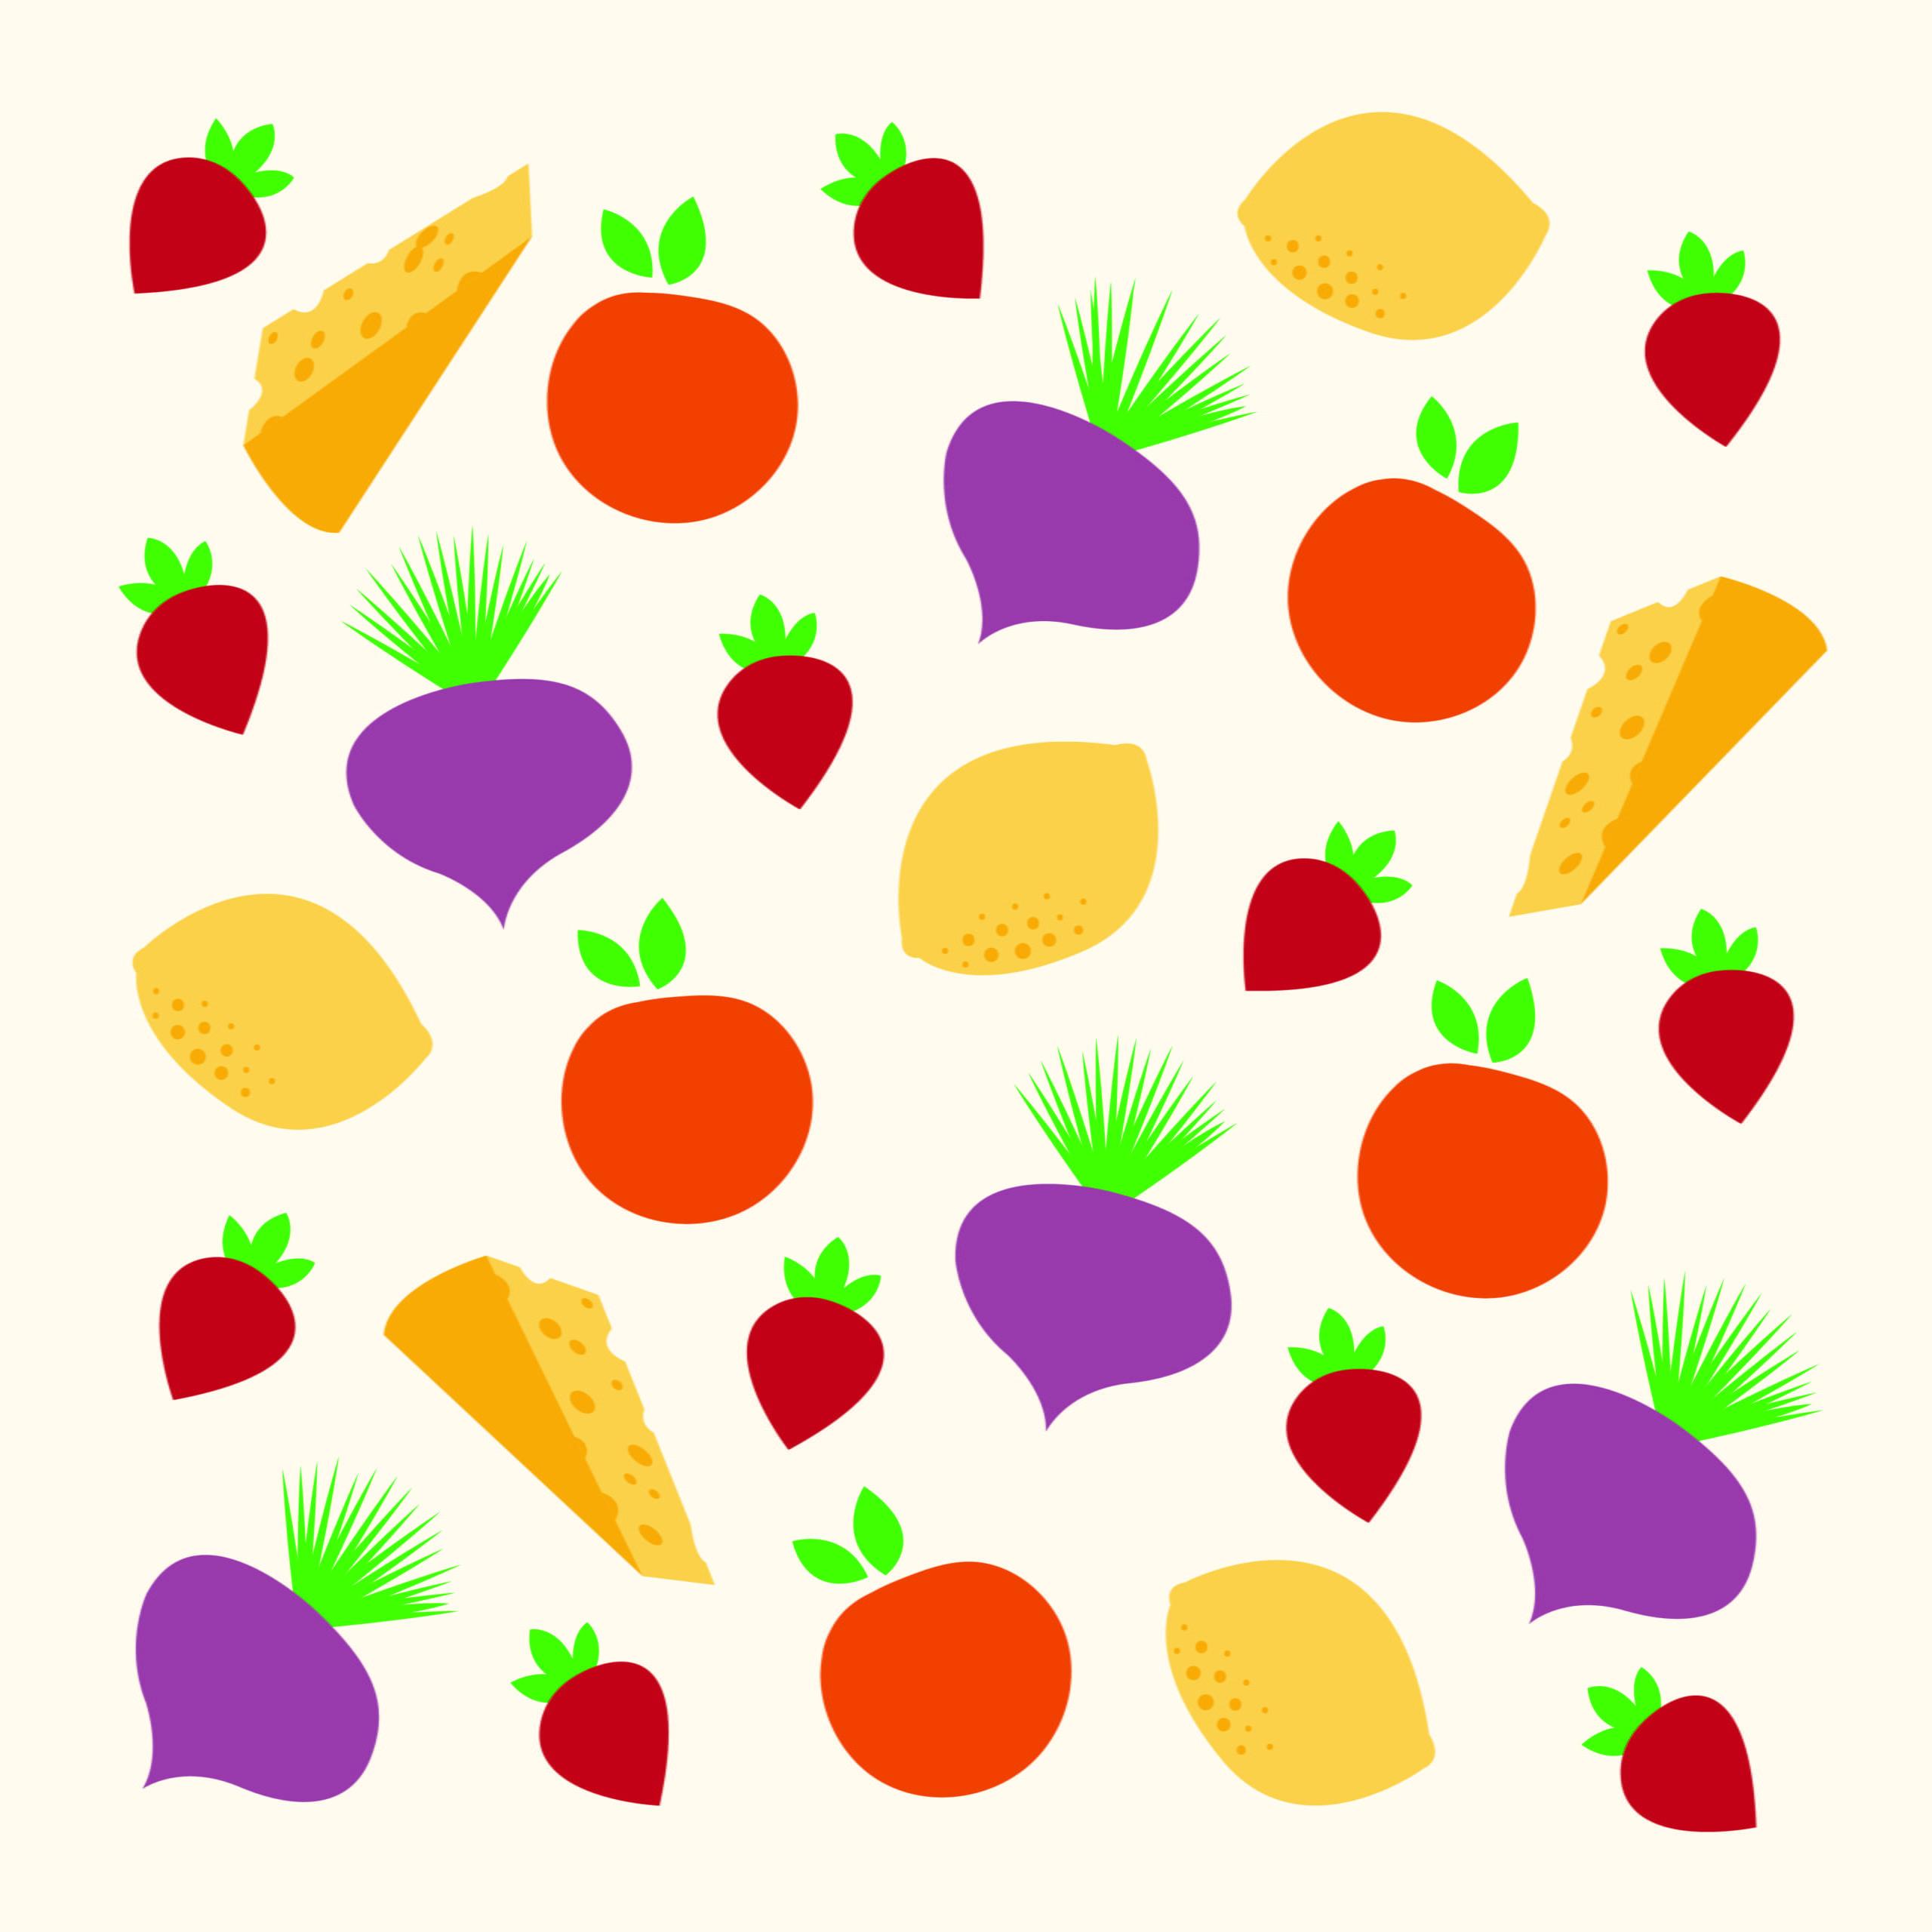 Food illustration by Rita Azar for 360 Magazine